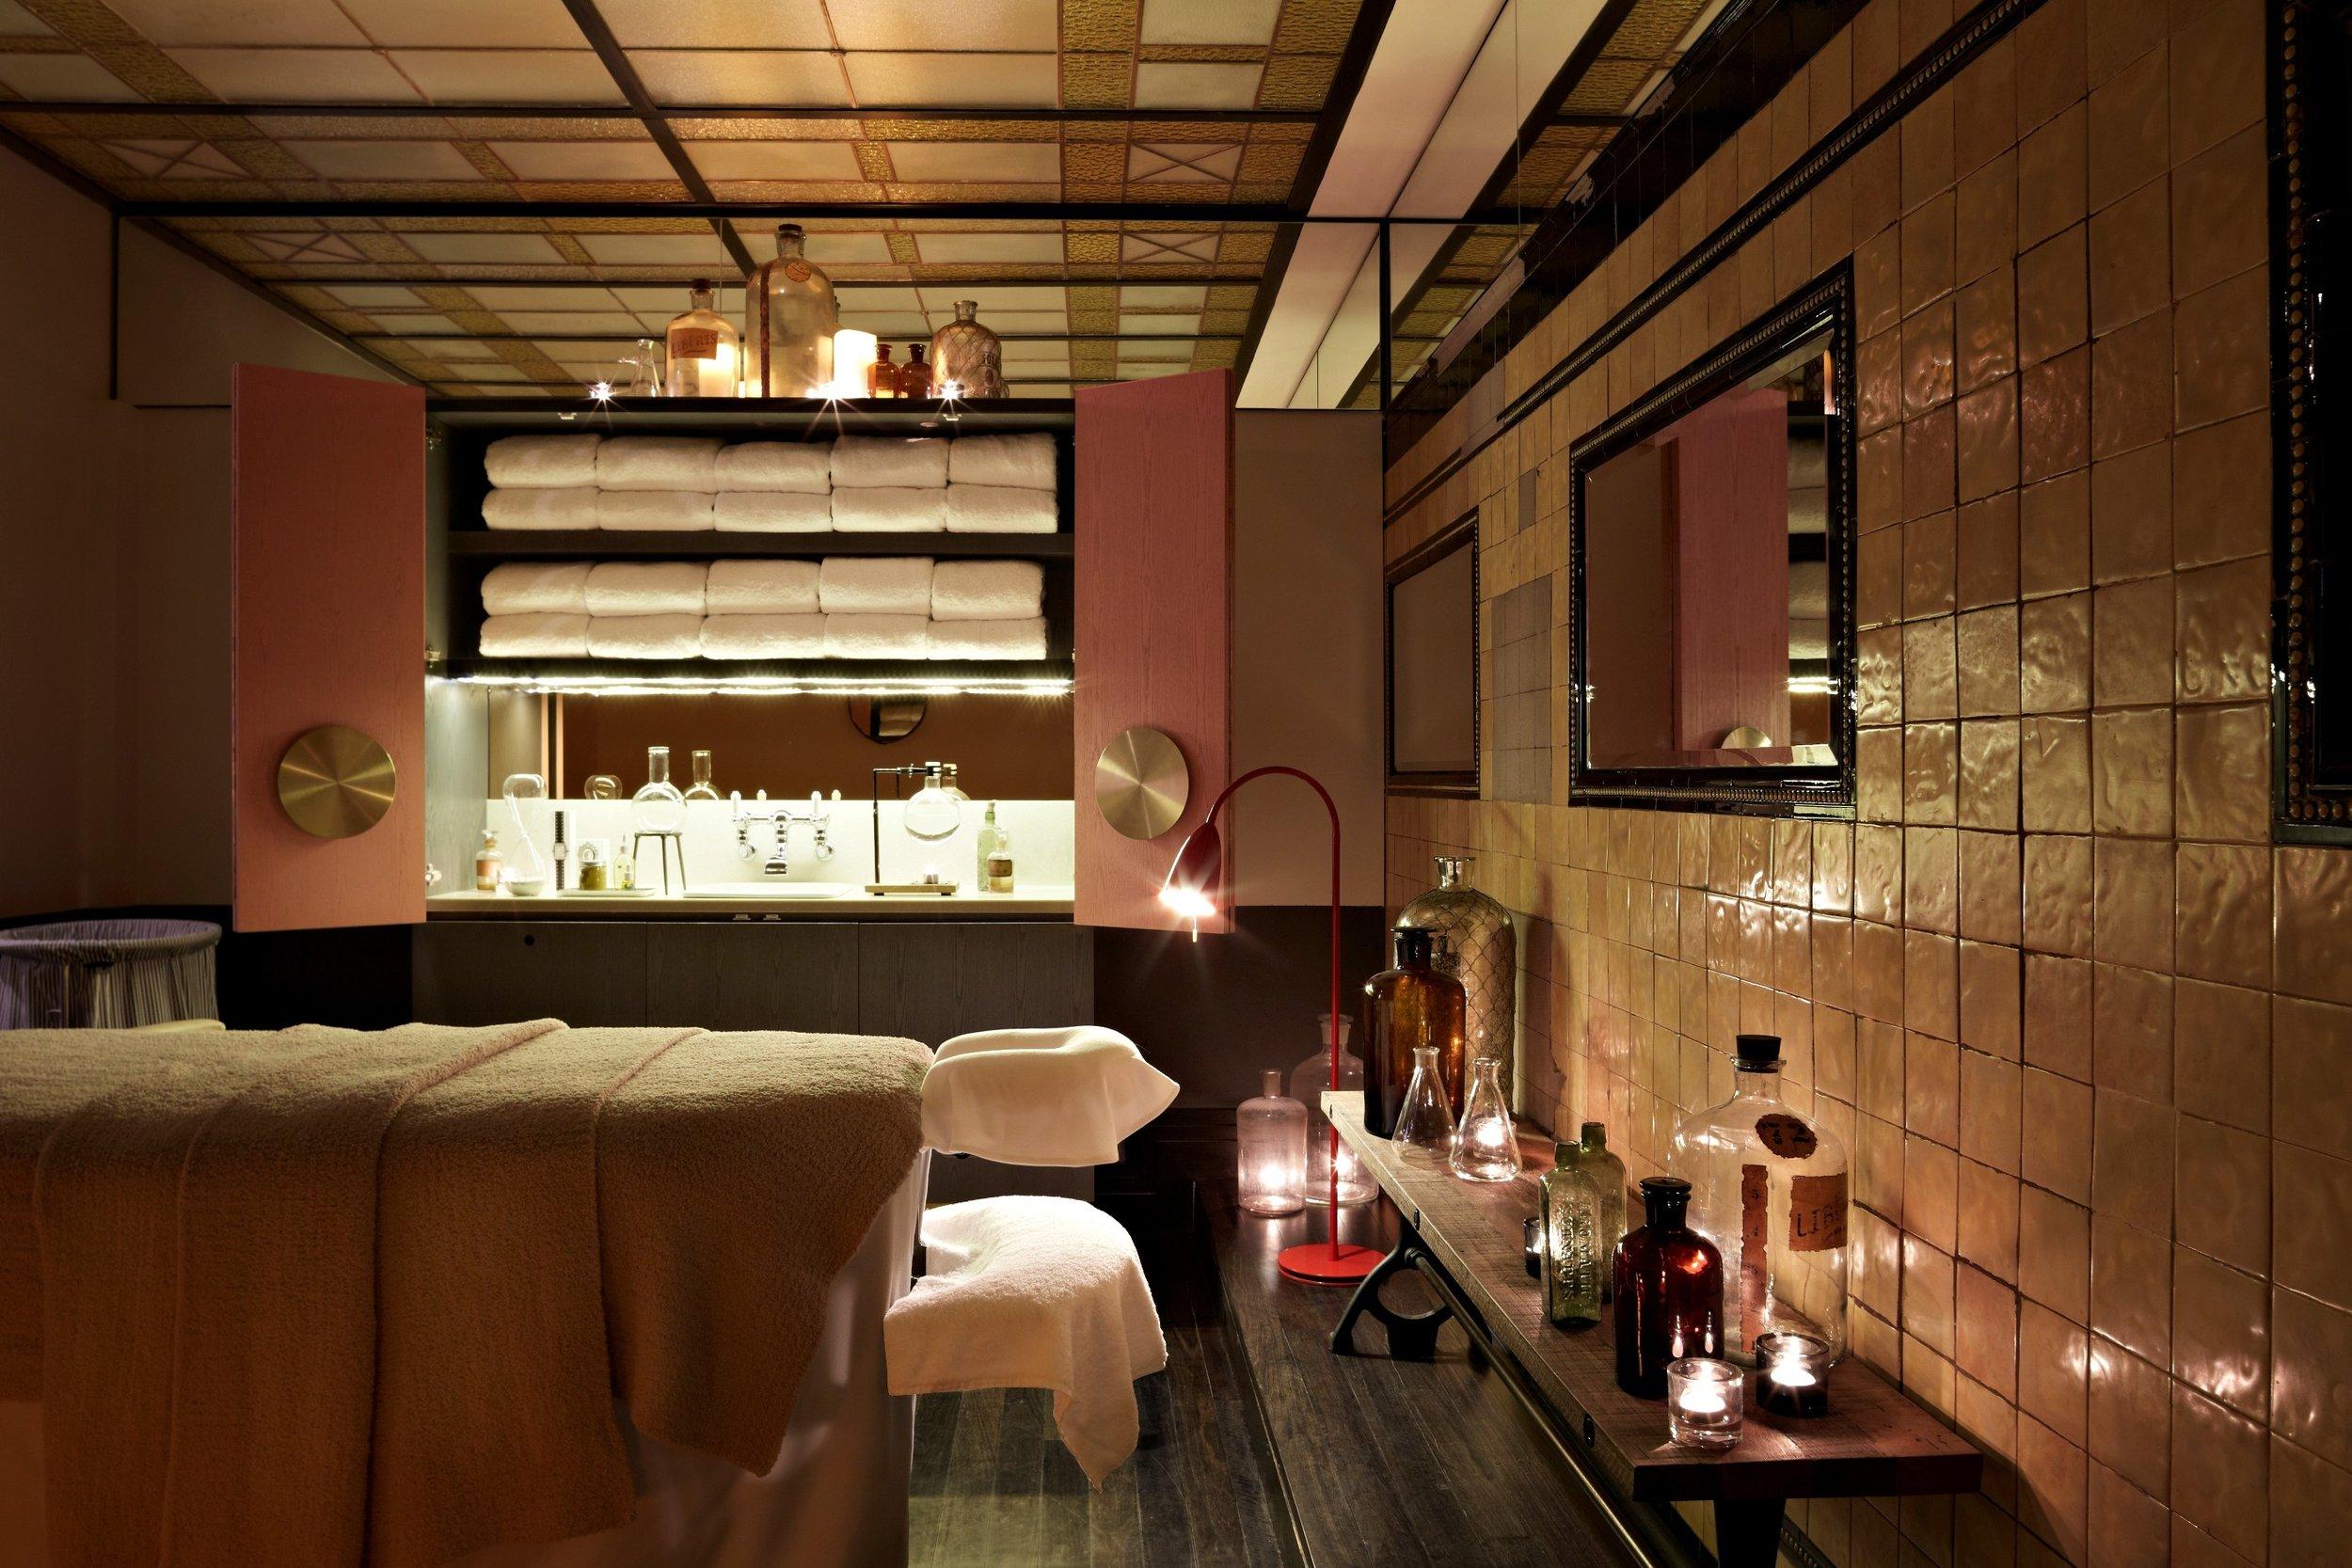 QT_Sydney_Private_Treatment_Room 20x m.jpg